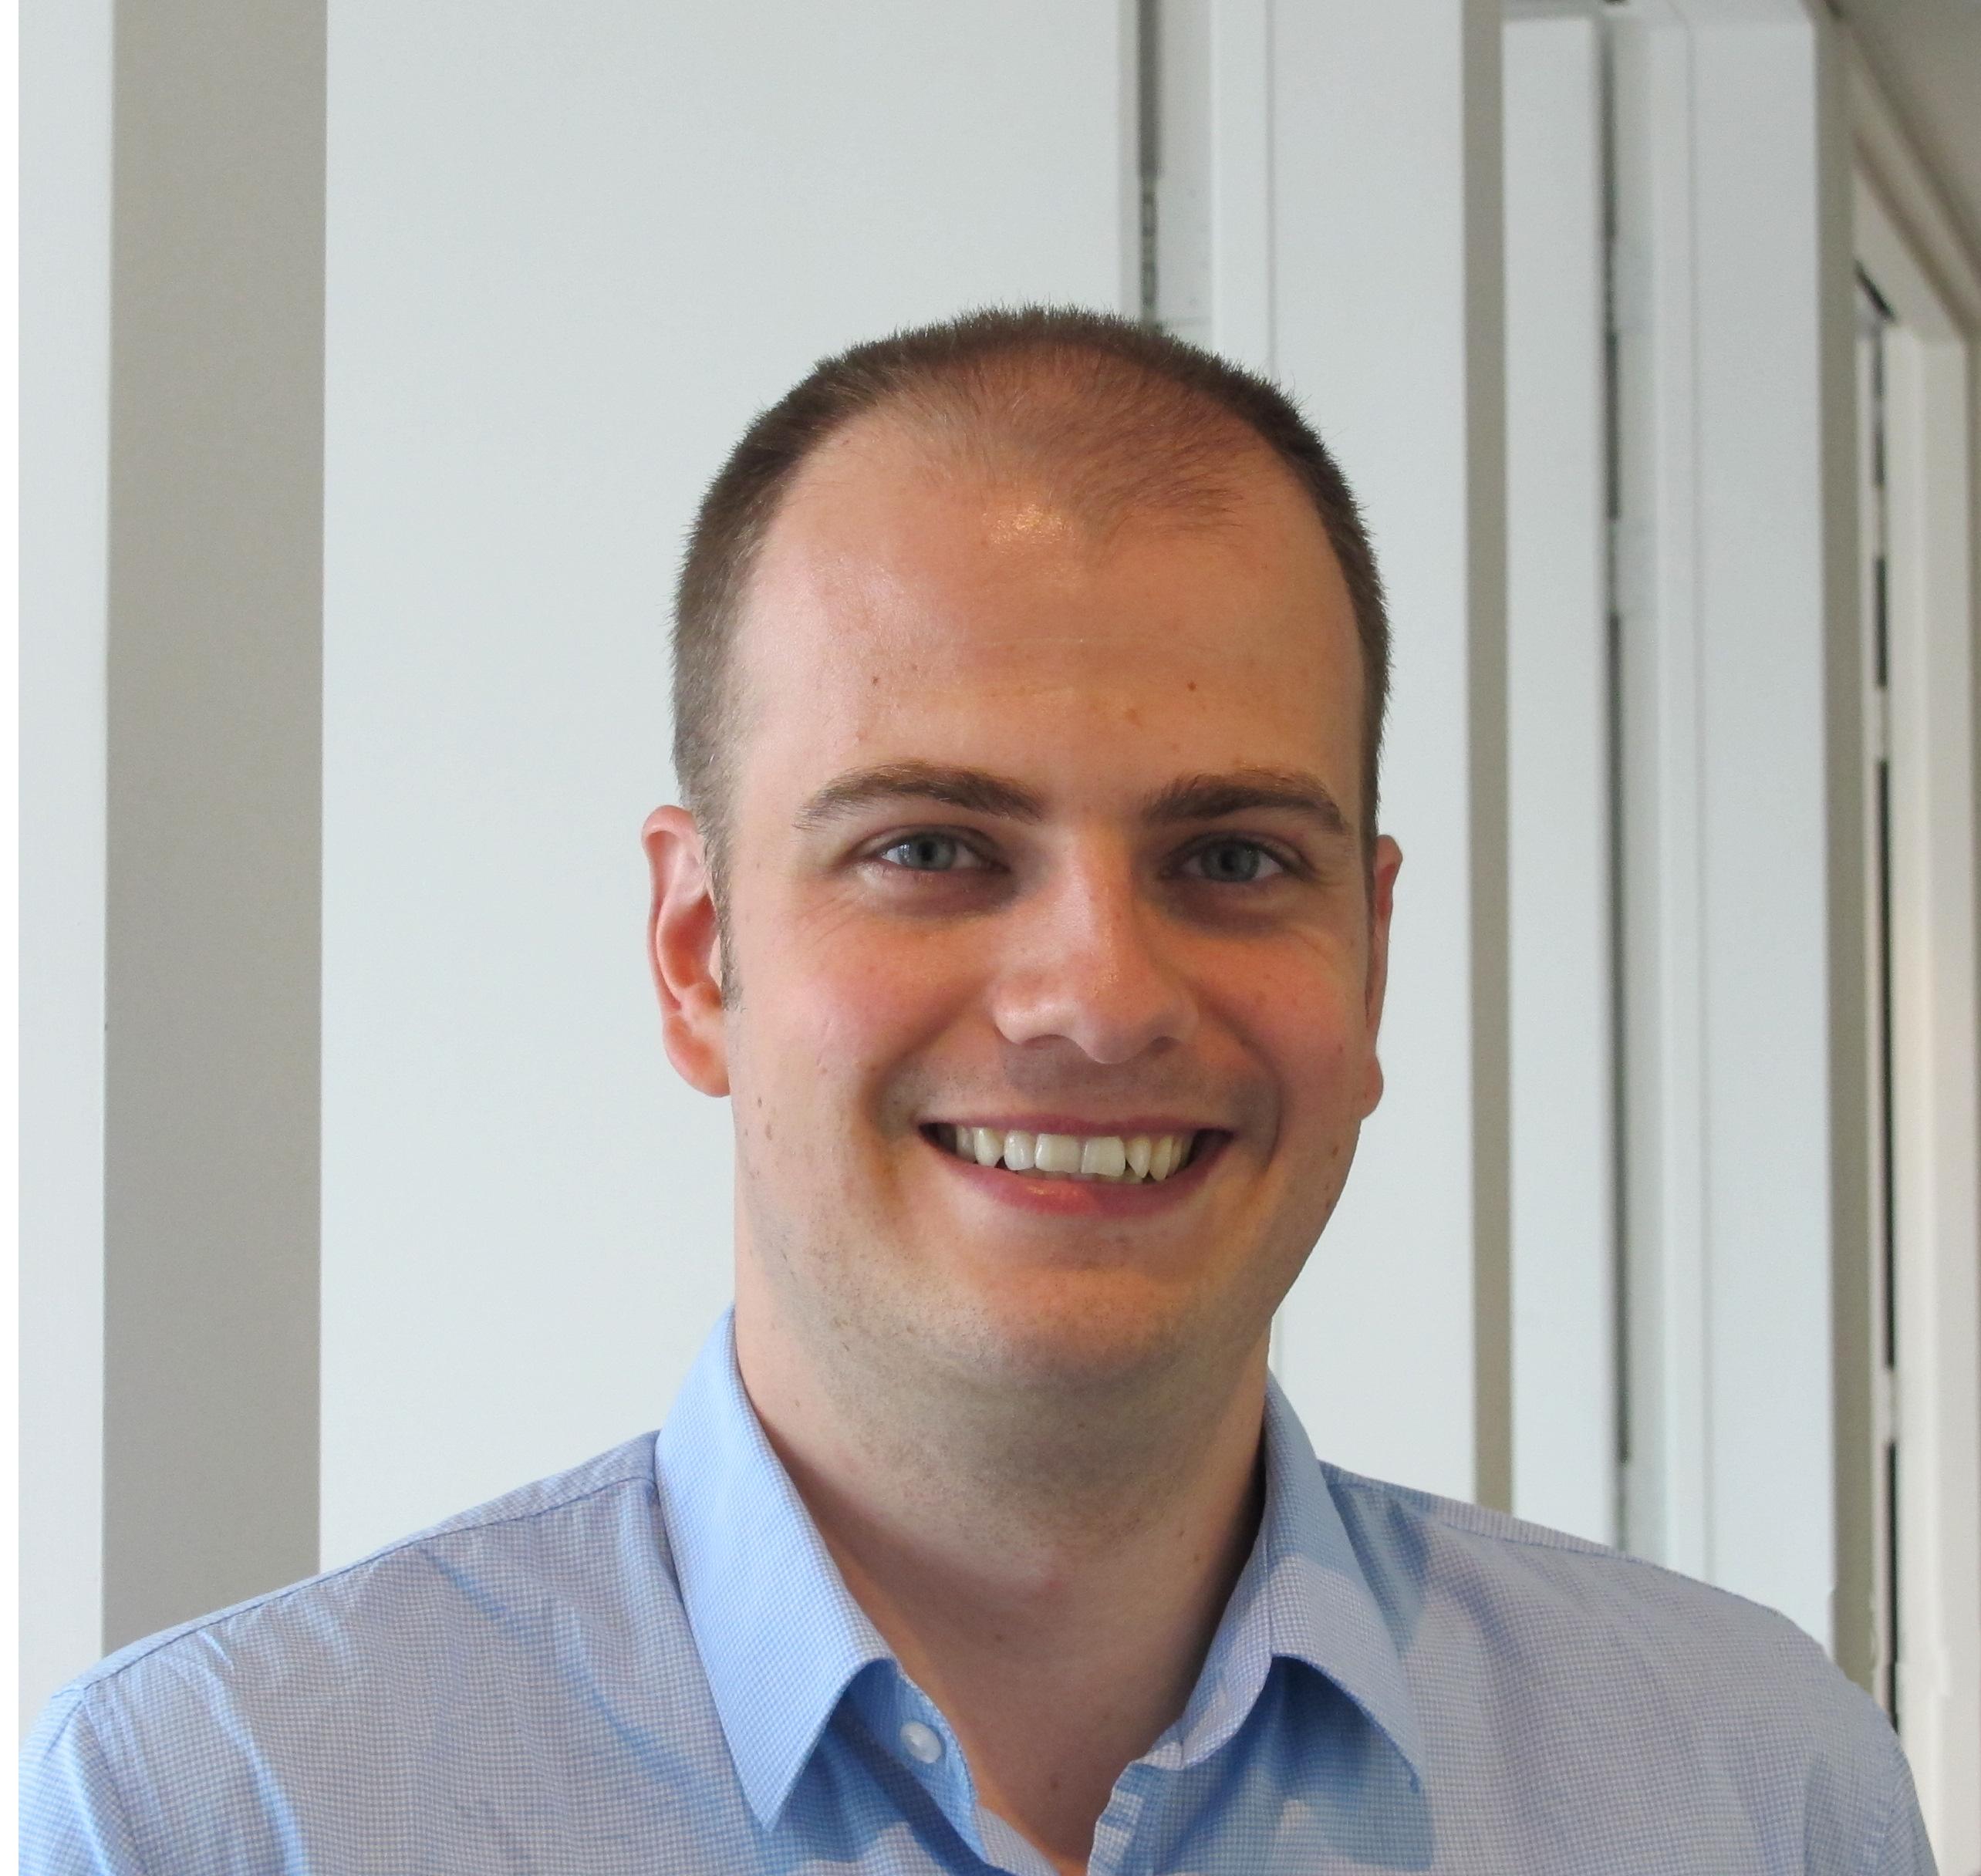 Dr Antony van der Ent - Sustainable Minerals Institute